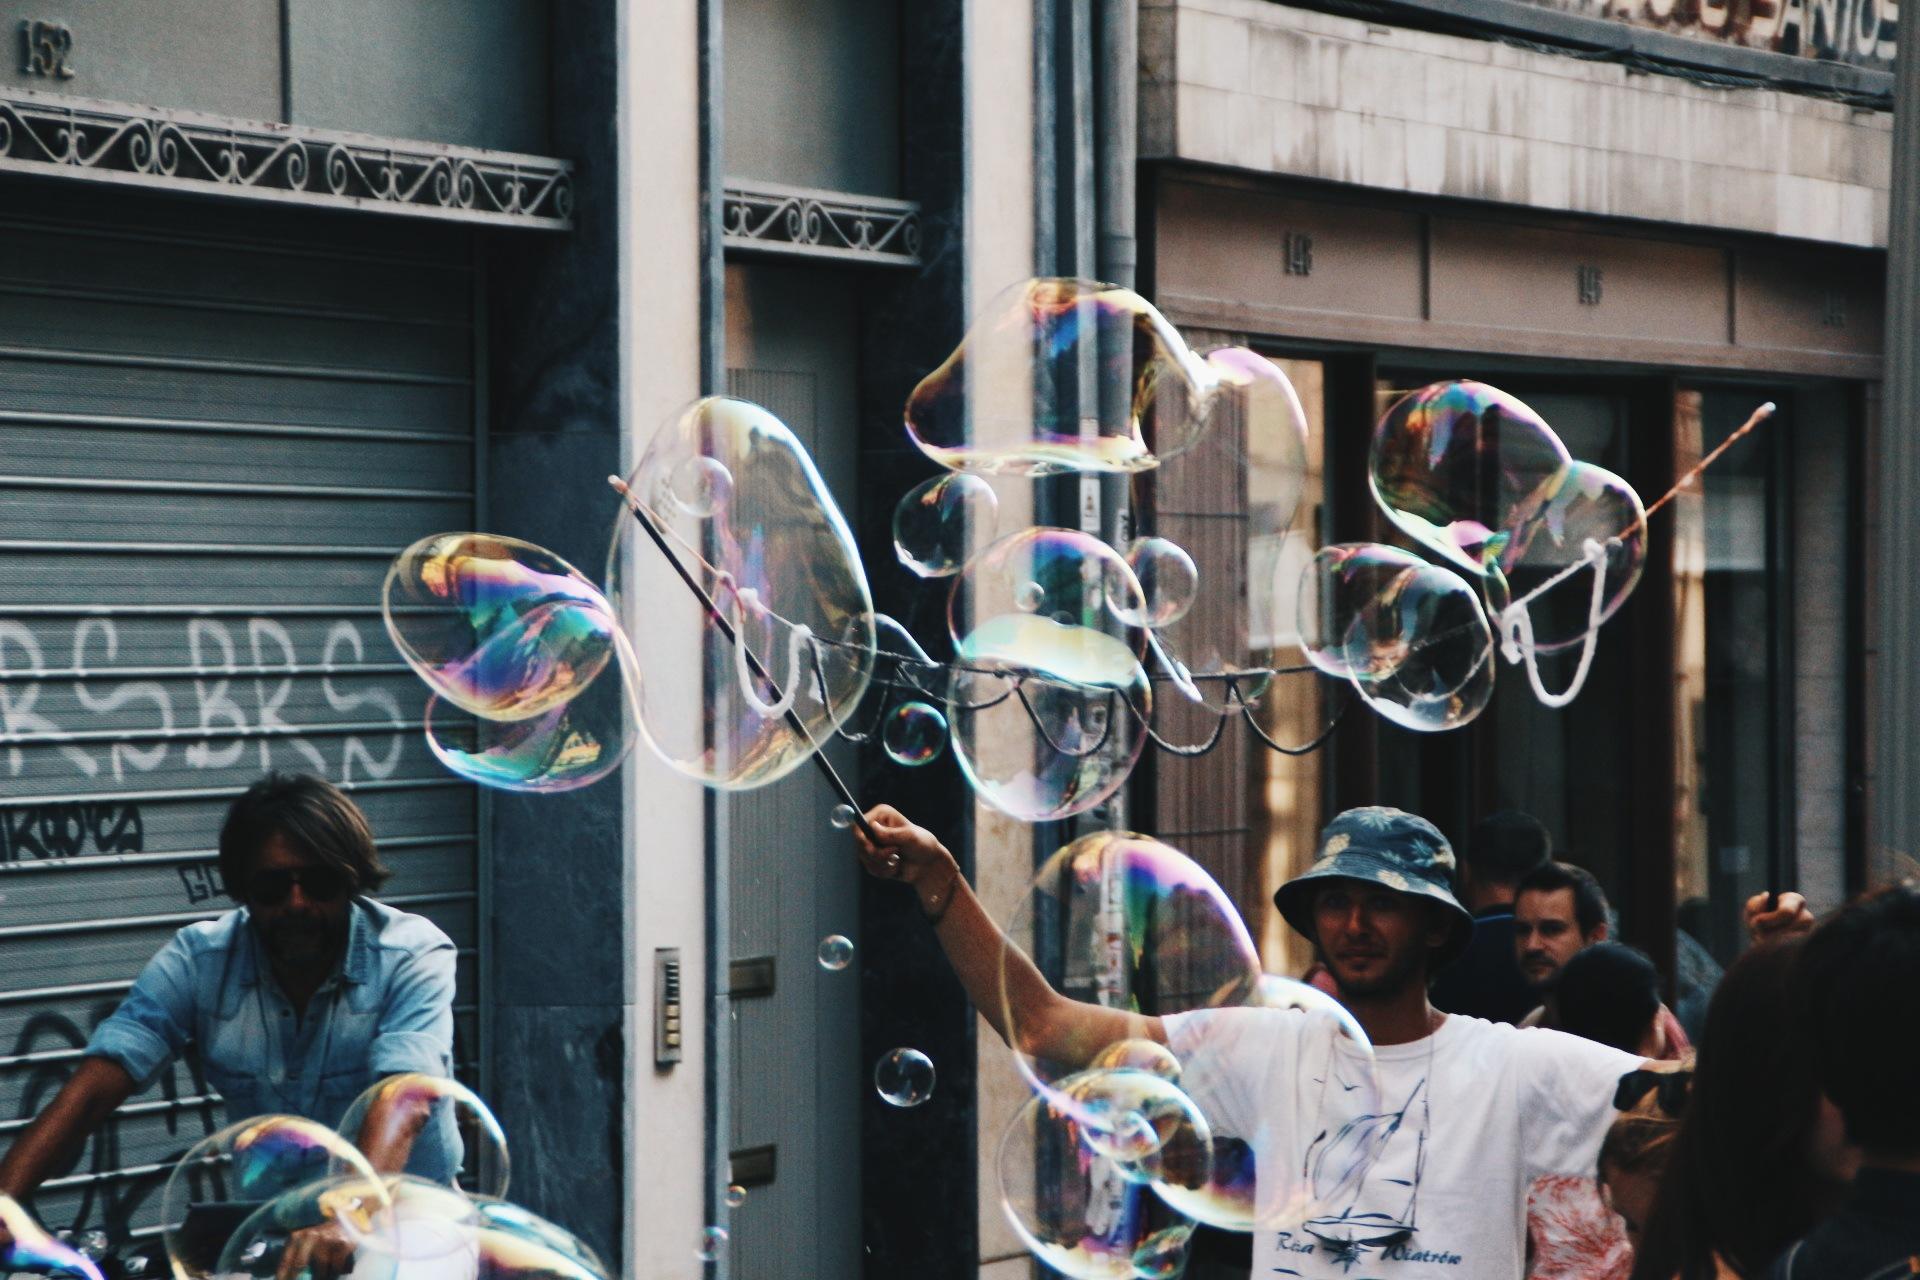 Bubbles in the street by tessaklok